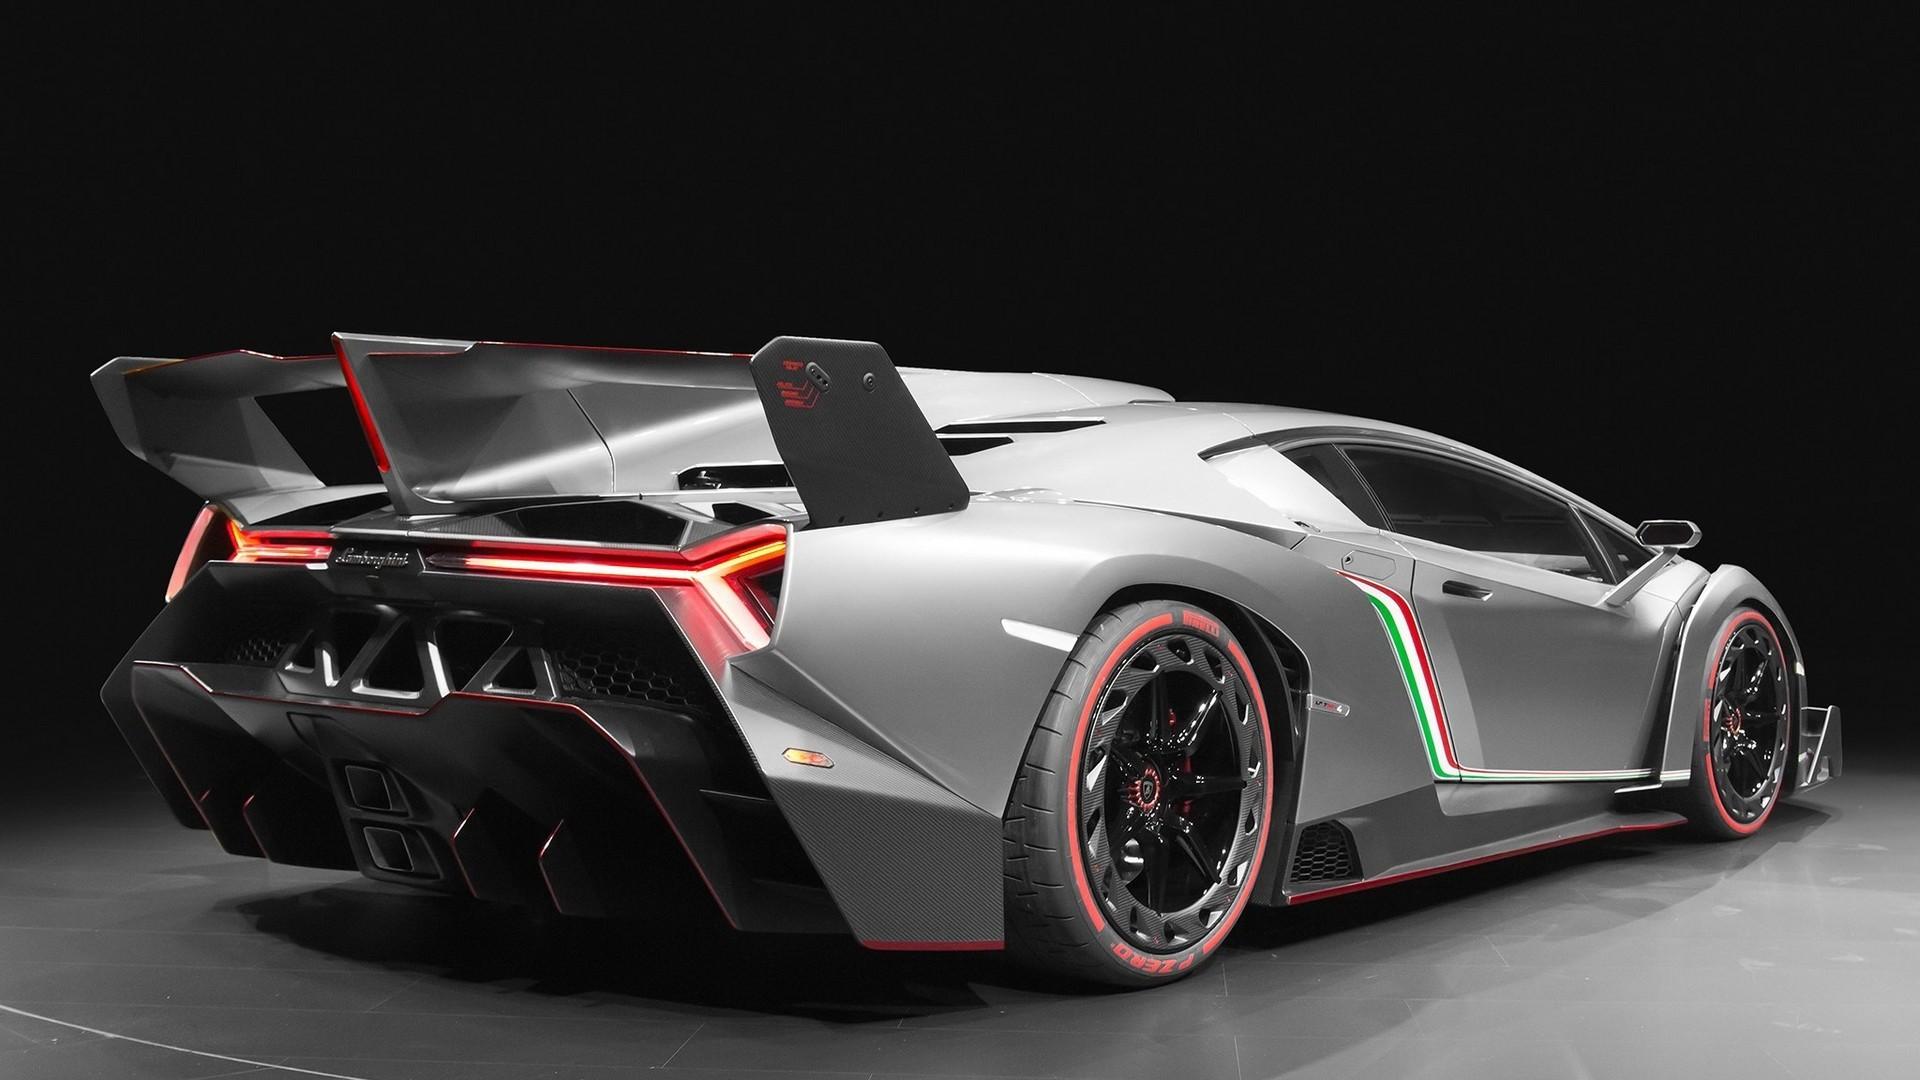 Lamborghini Veneno Wallpaper 76 Images